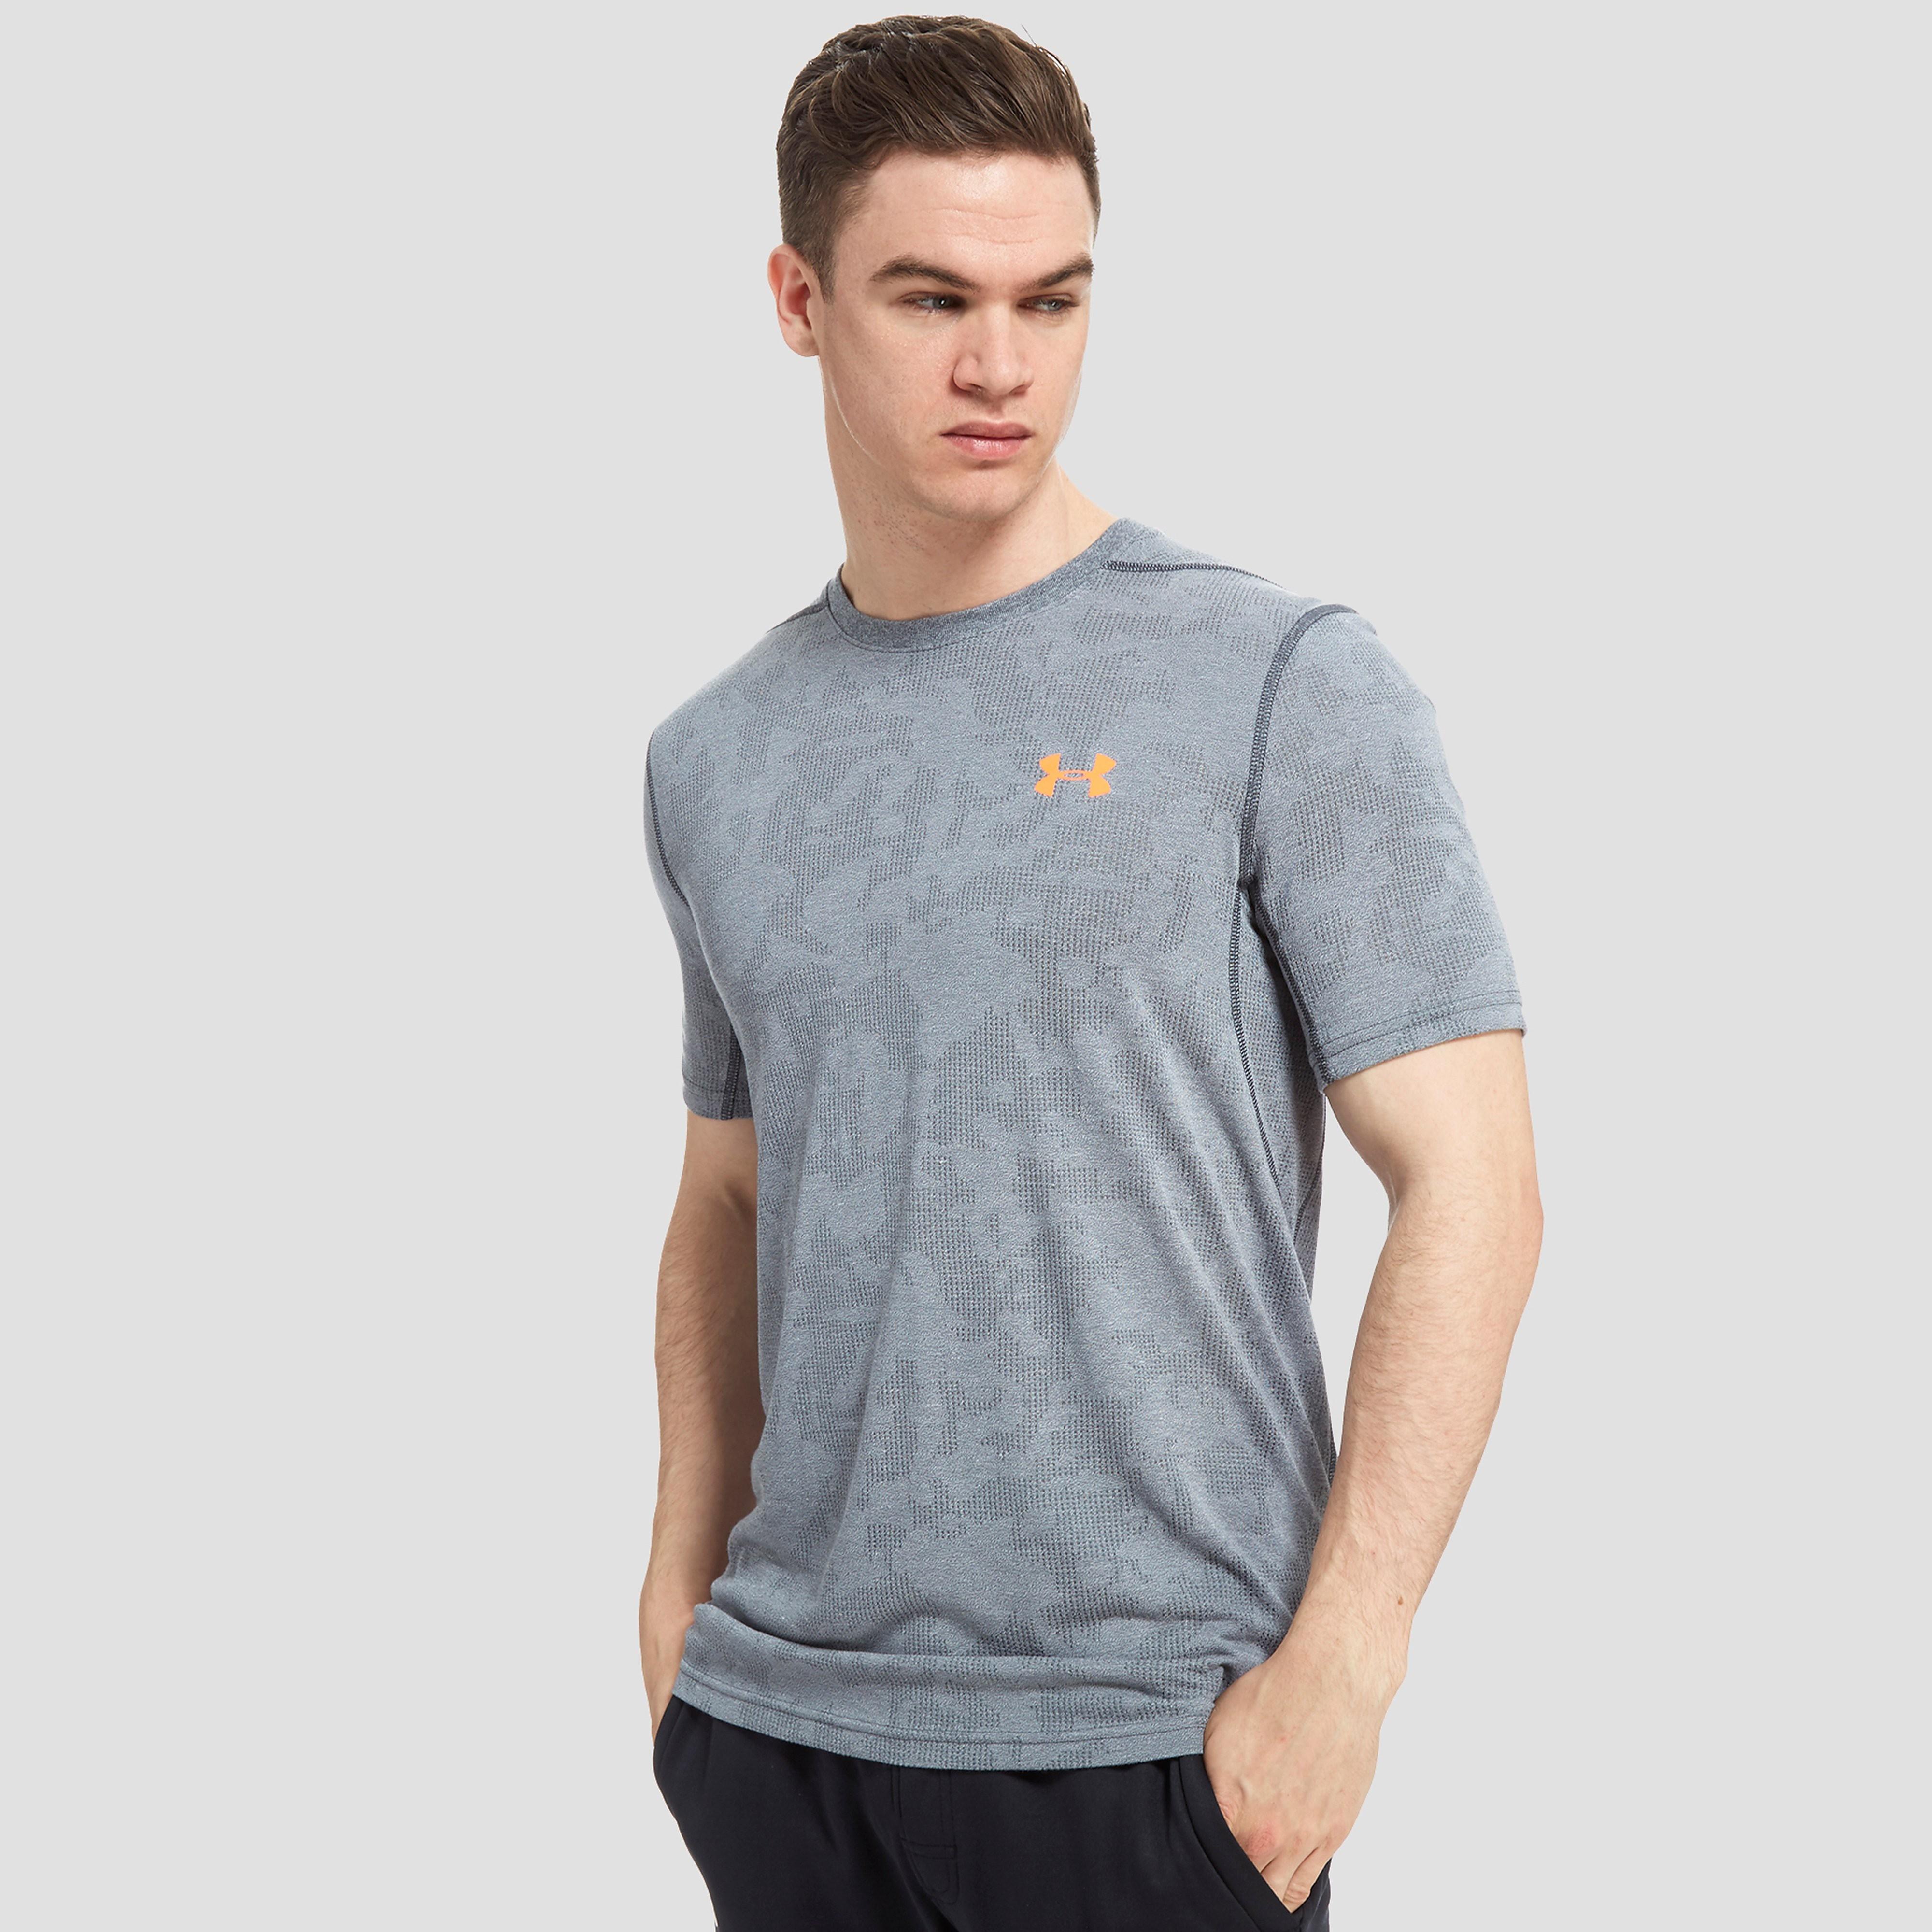 Under Armour Threadborne Camo T-Shirt